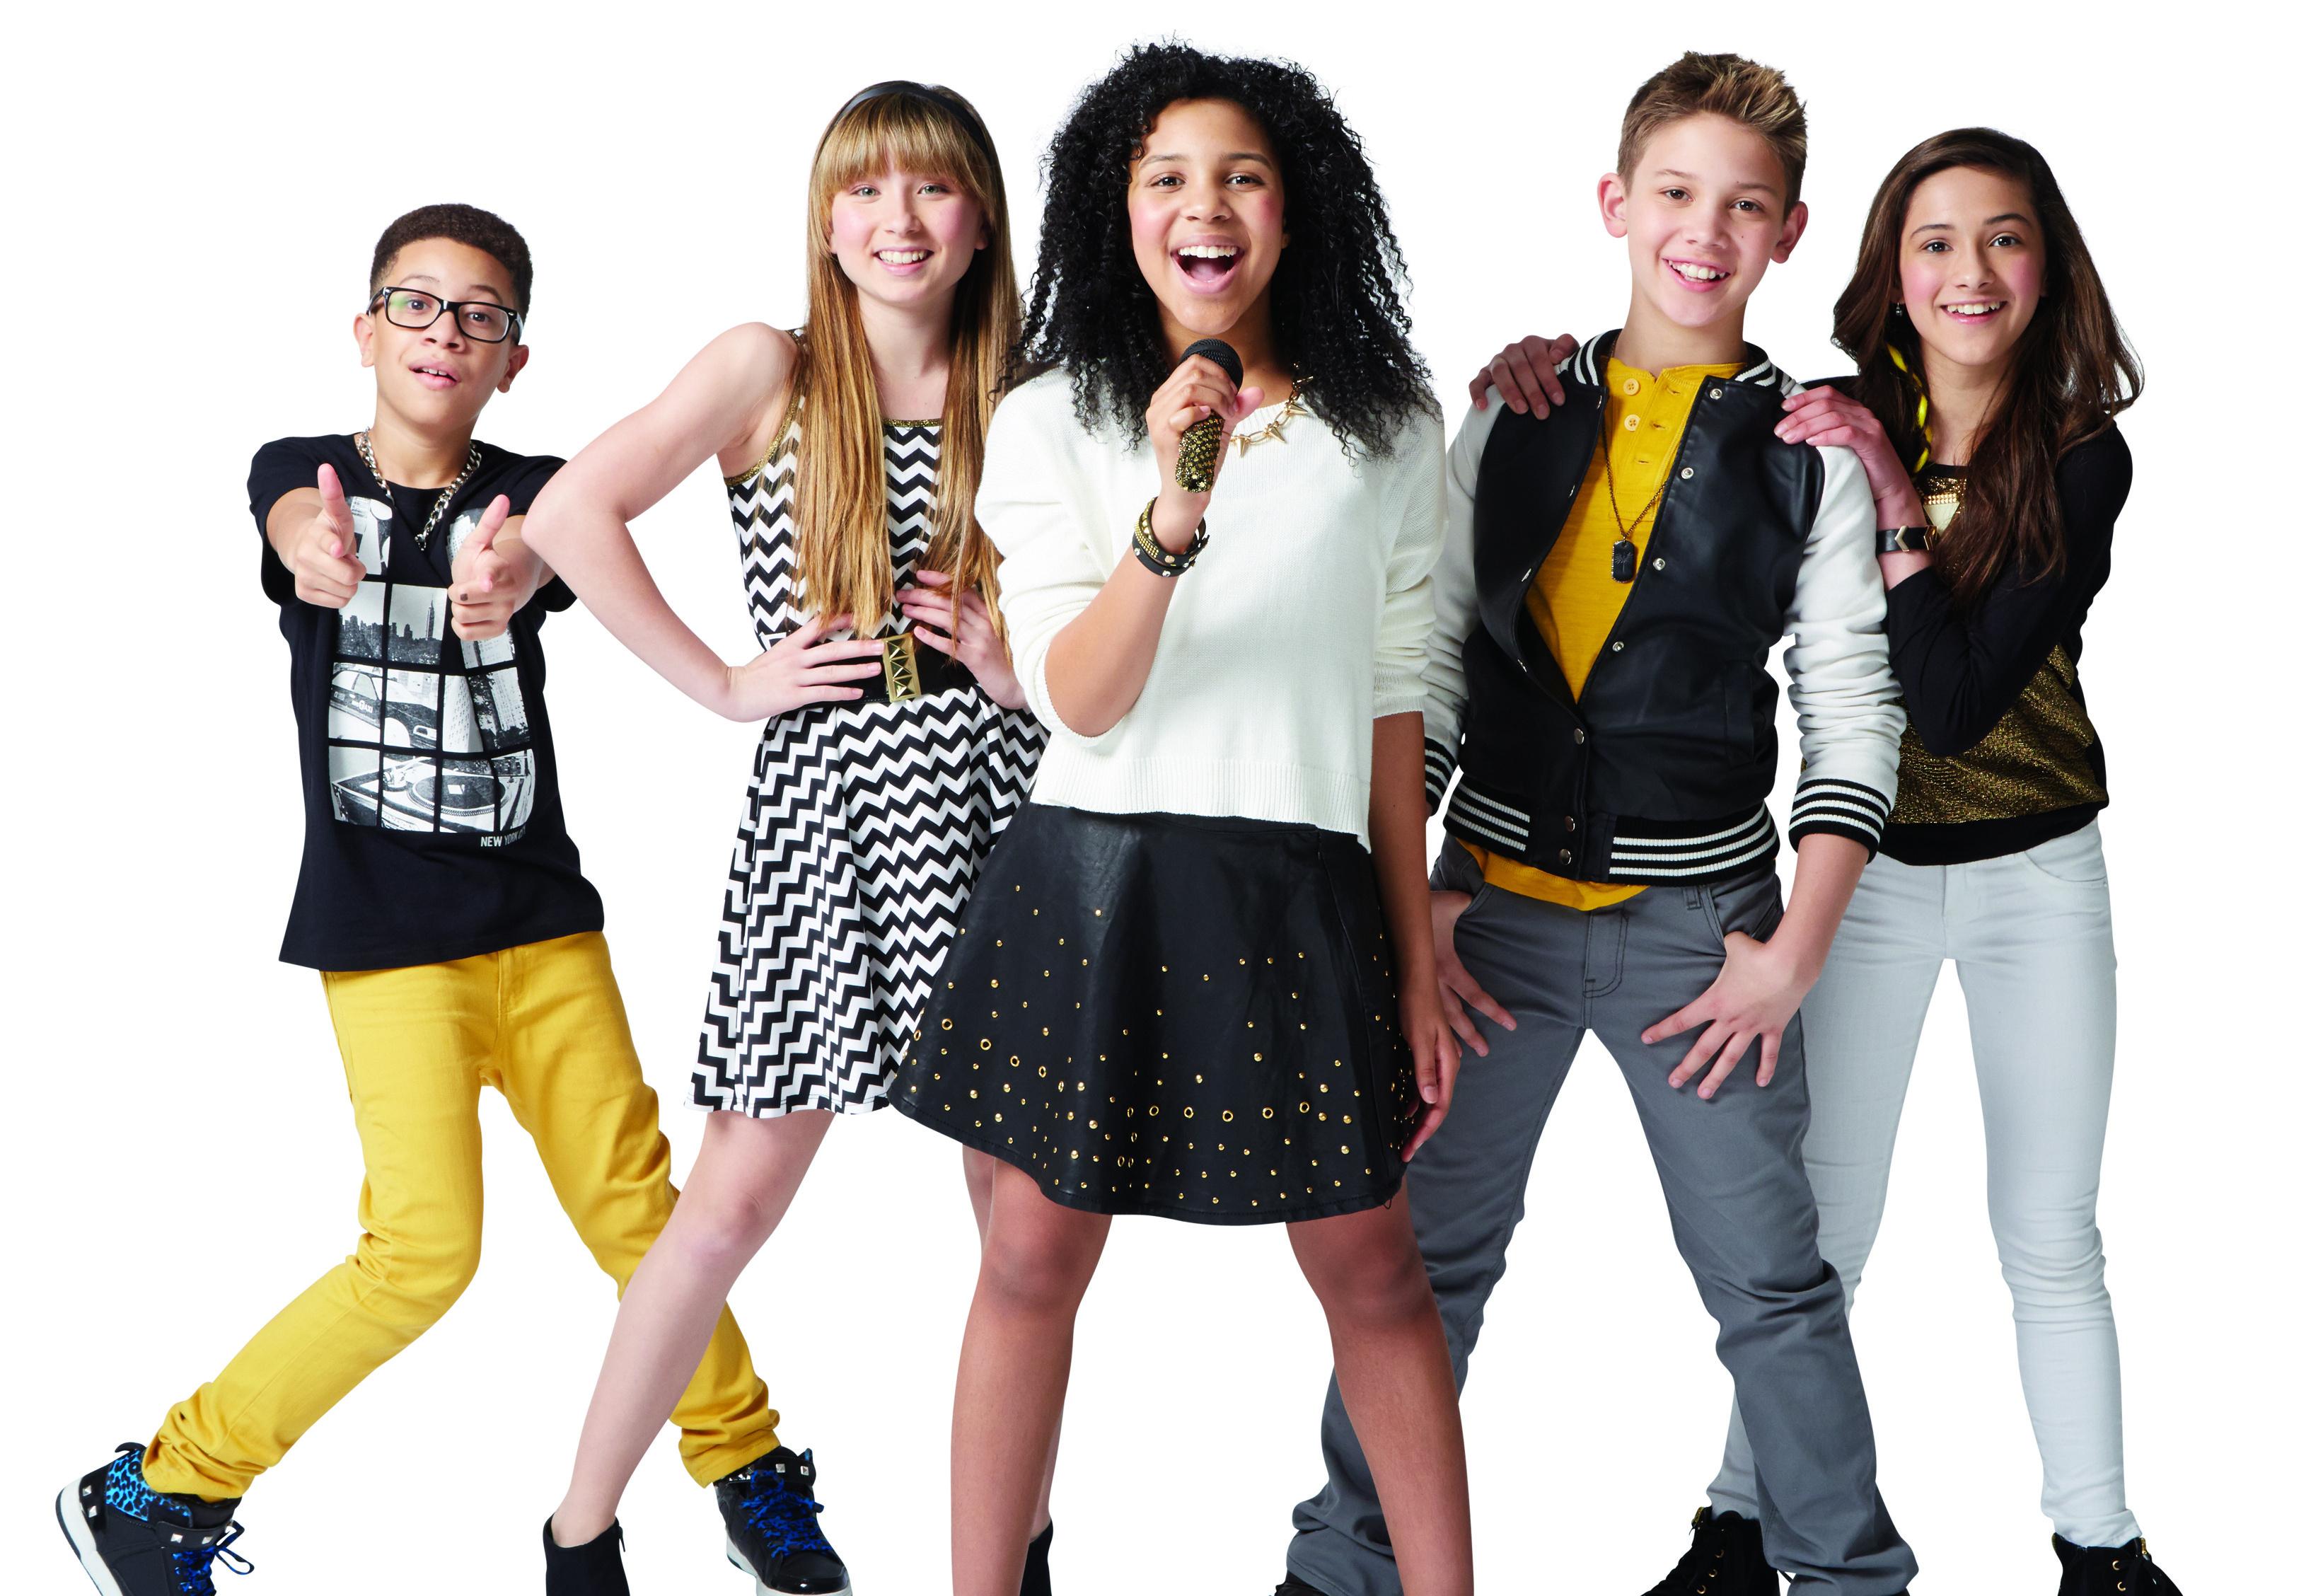 kidz bop tweaks pop for young audience | the spokesman-review